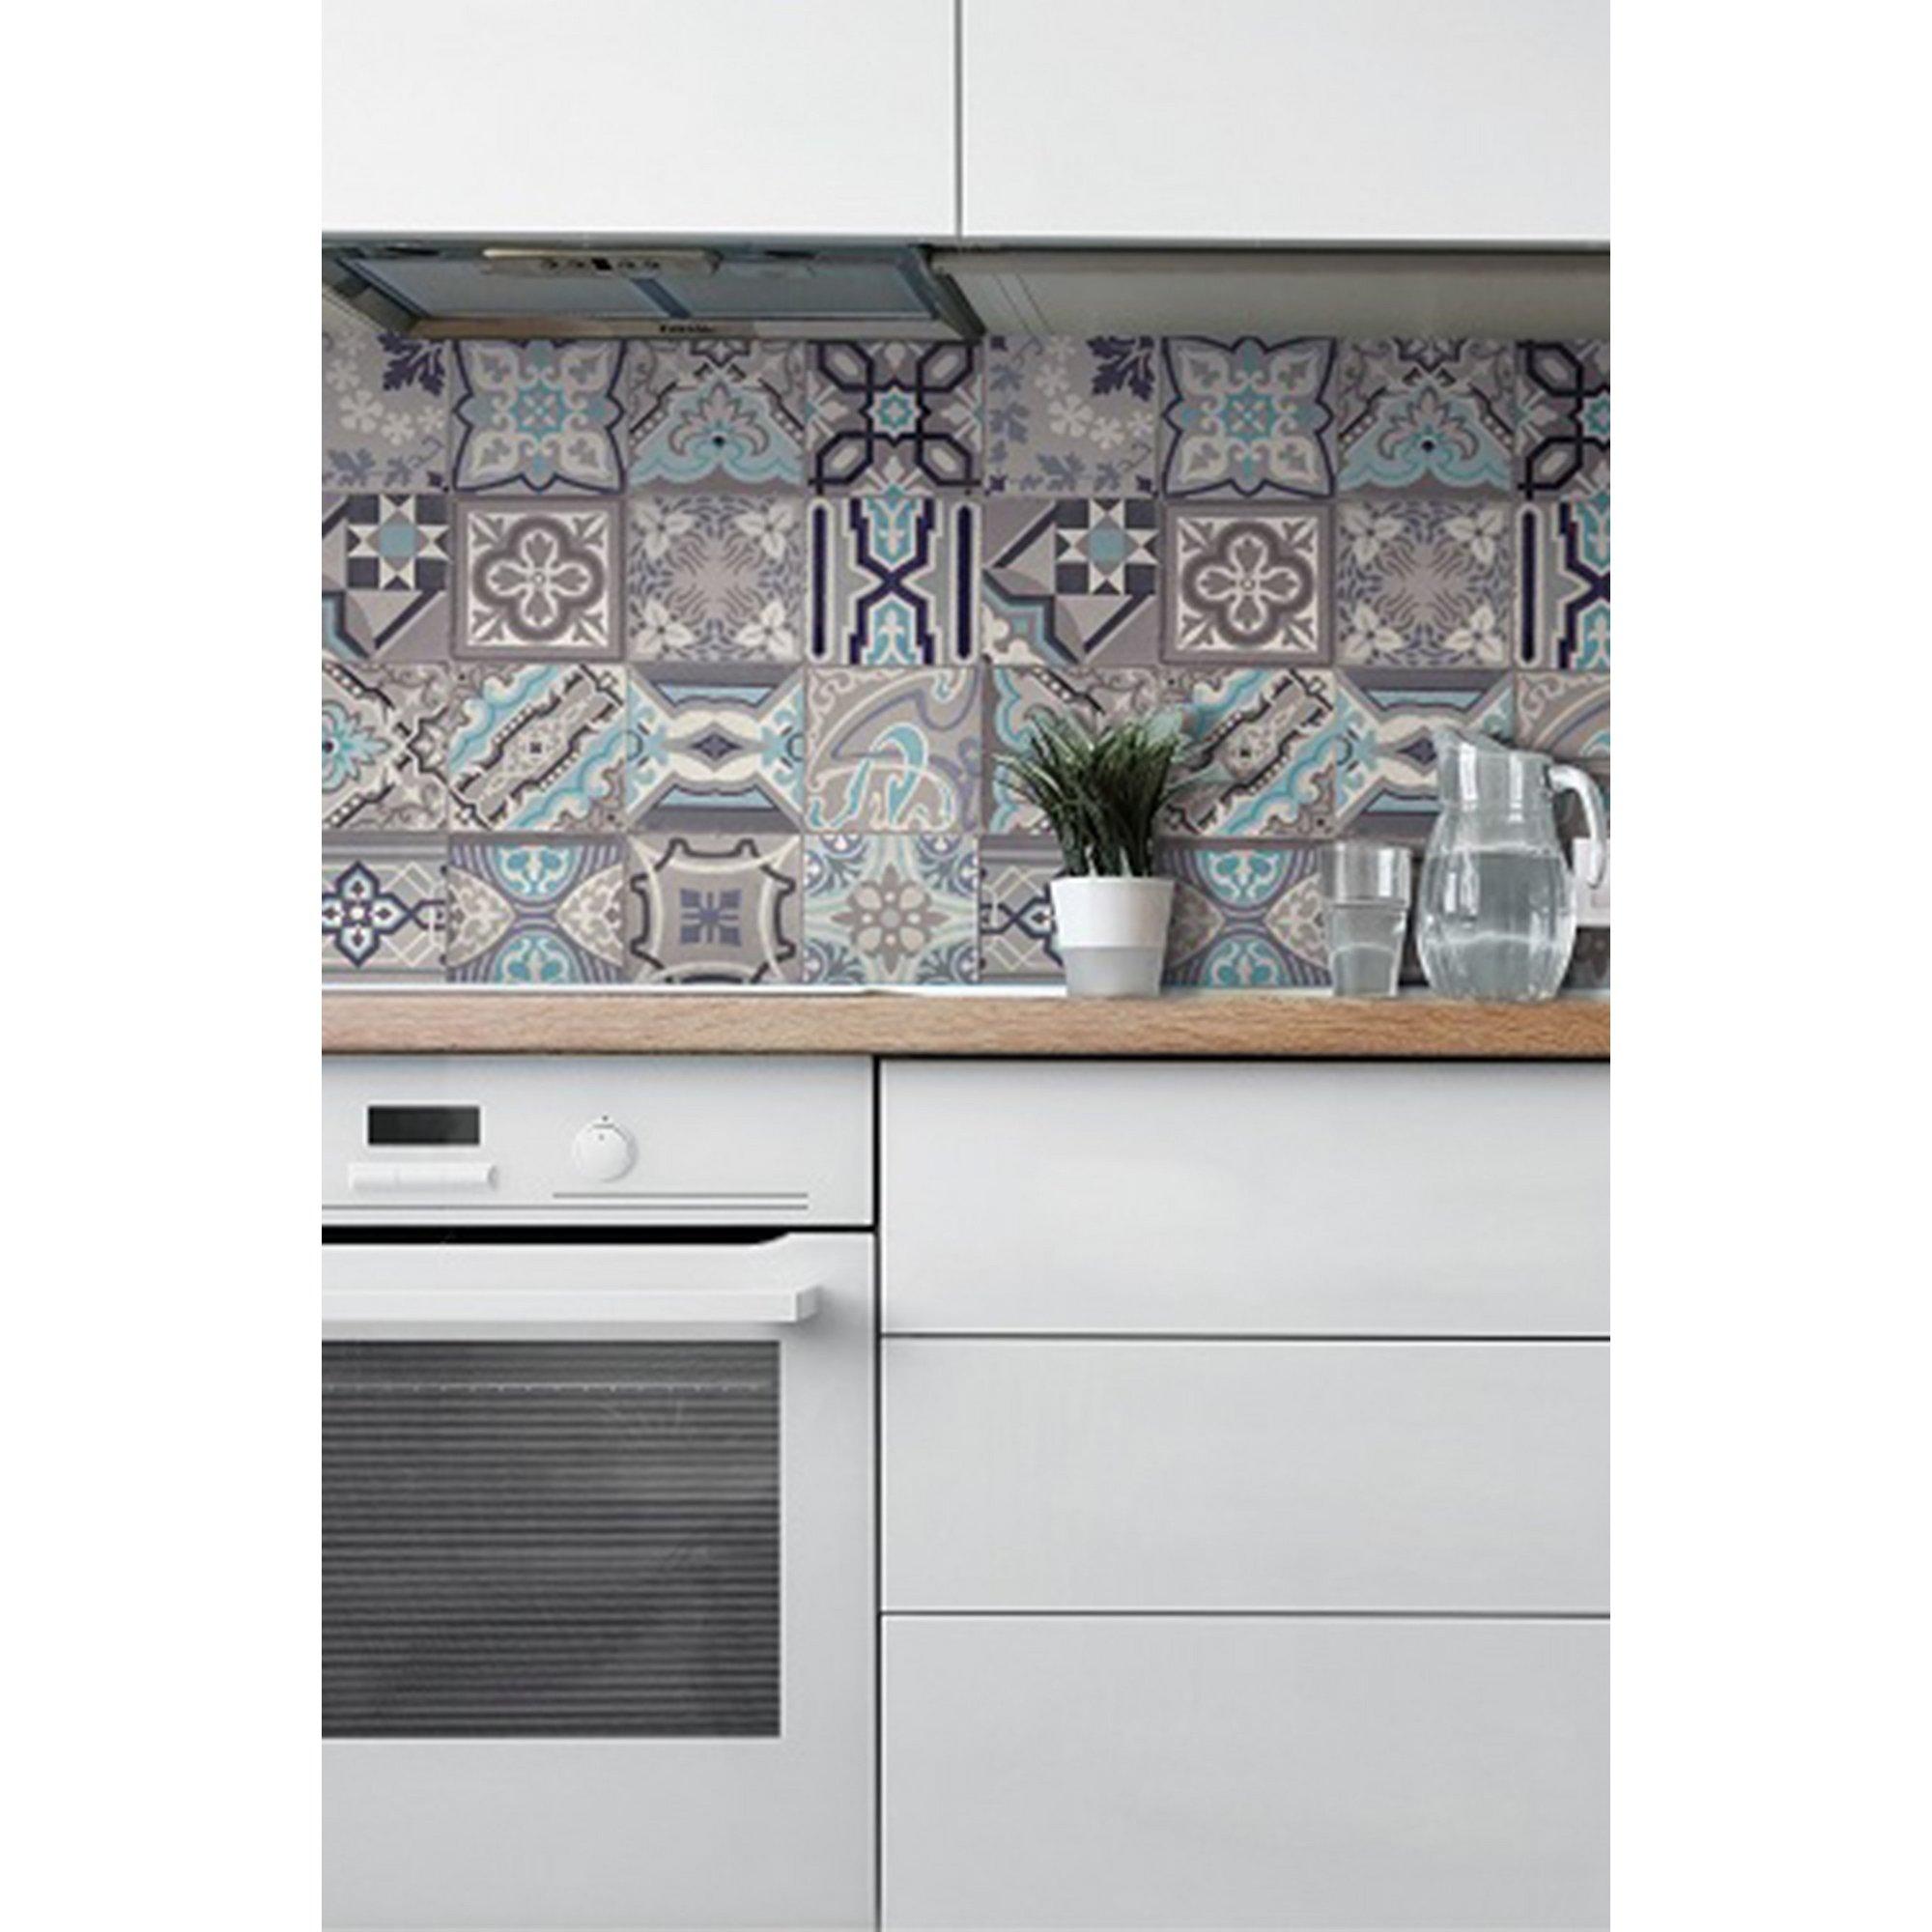 Image of D-C-Fix 3D Wallpaper for Splashbacks Moroccan Tile Simenta Grey